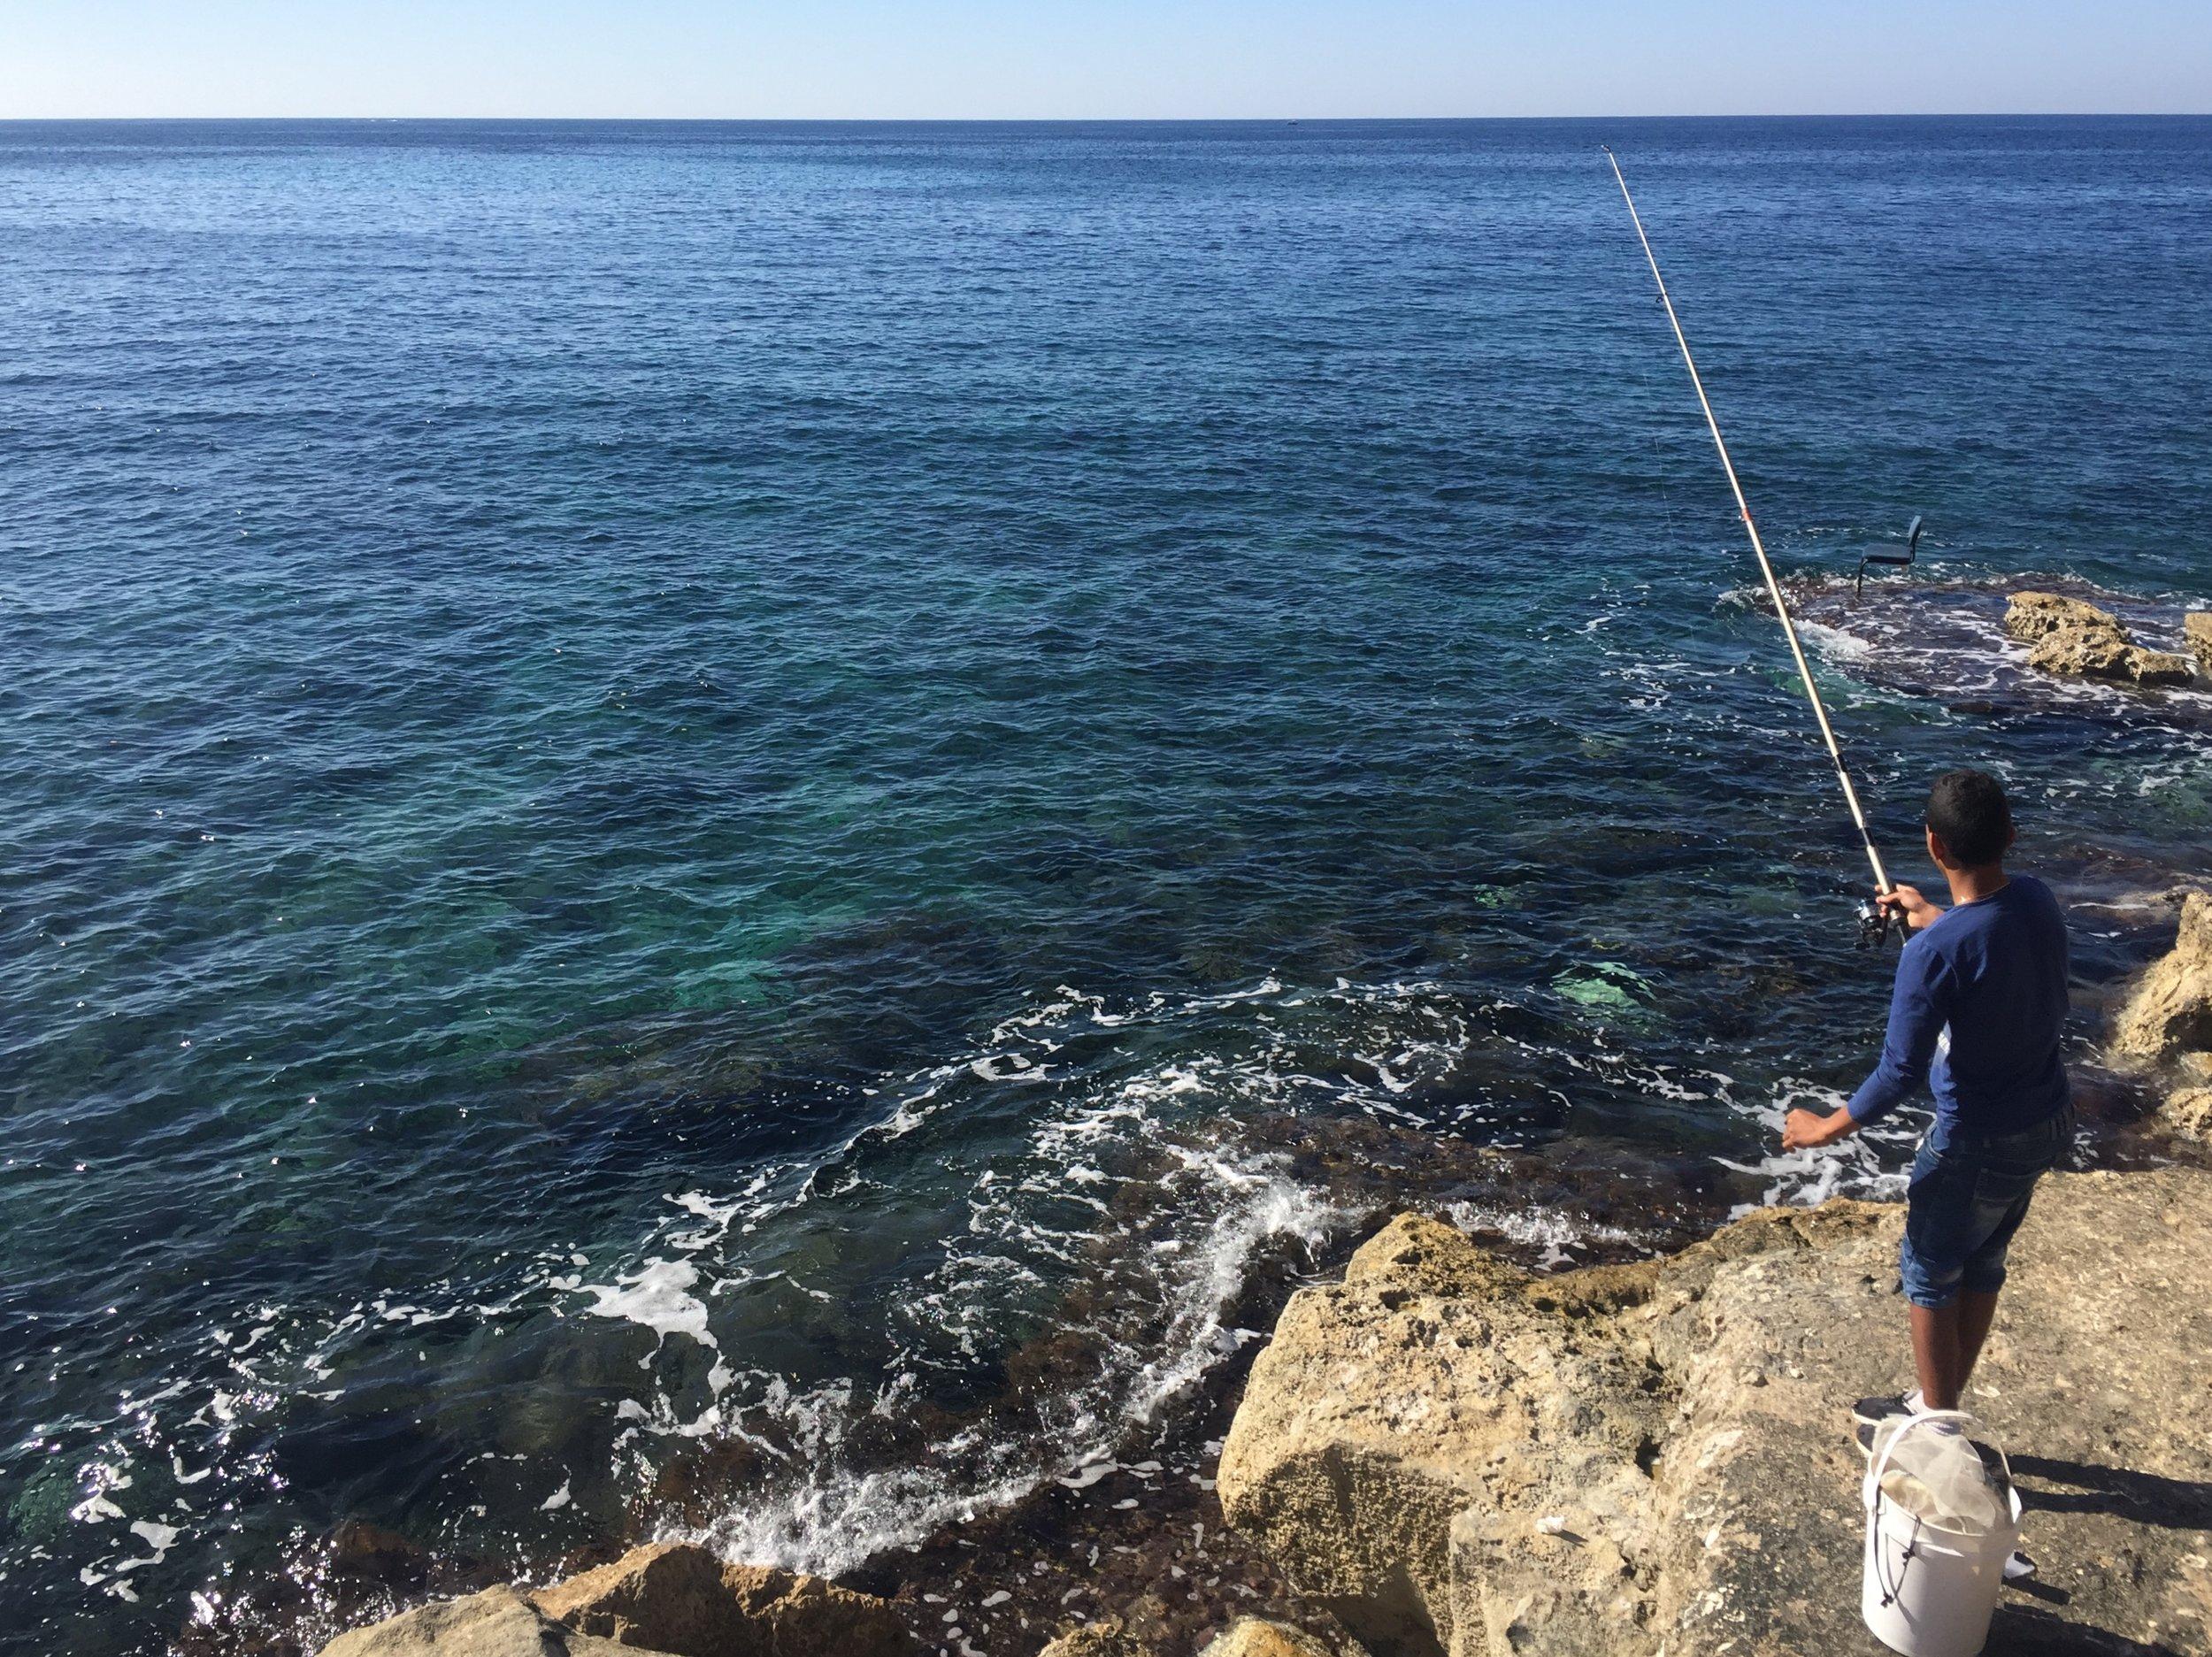 try wonder inspo akko acre fisherman by coast